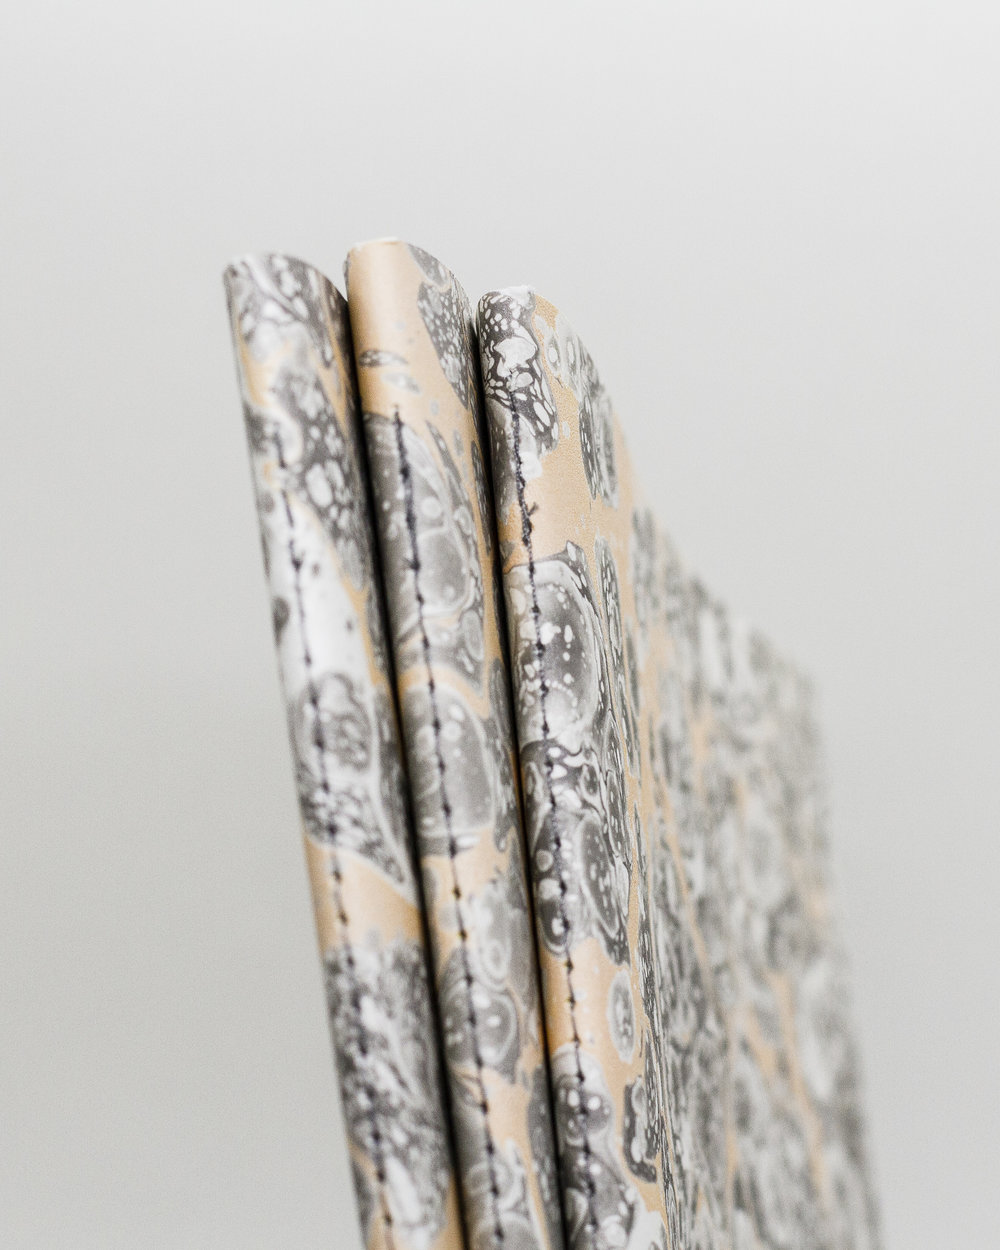 Tomàs Avinent Marble Notebook Cahier Marbré-9.jpg